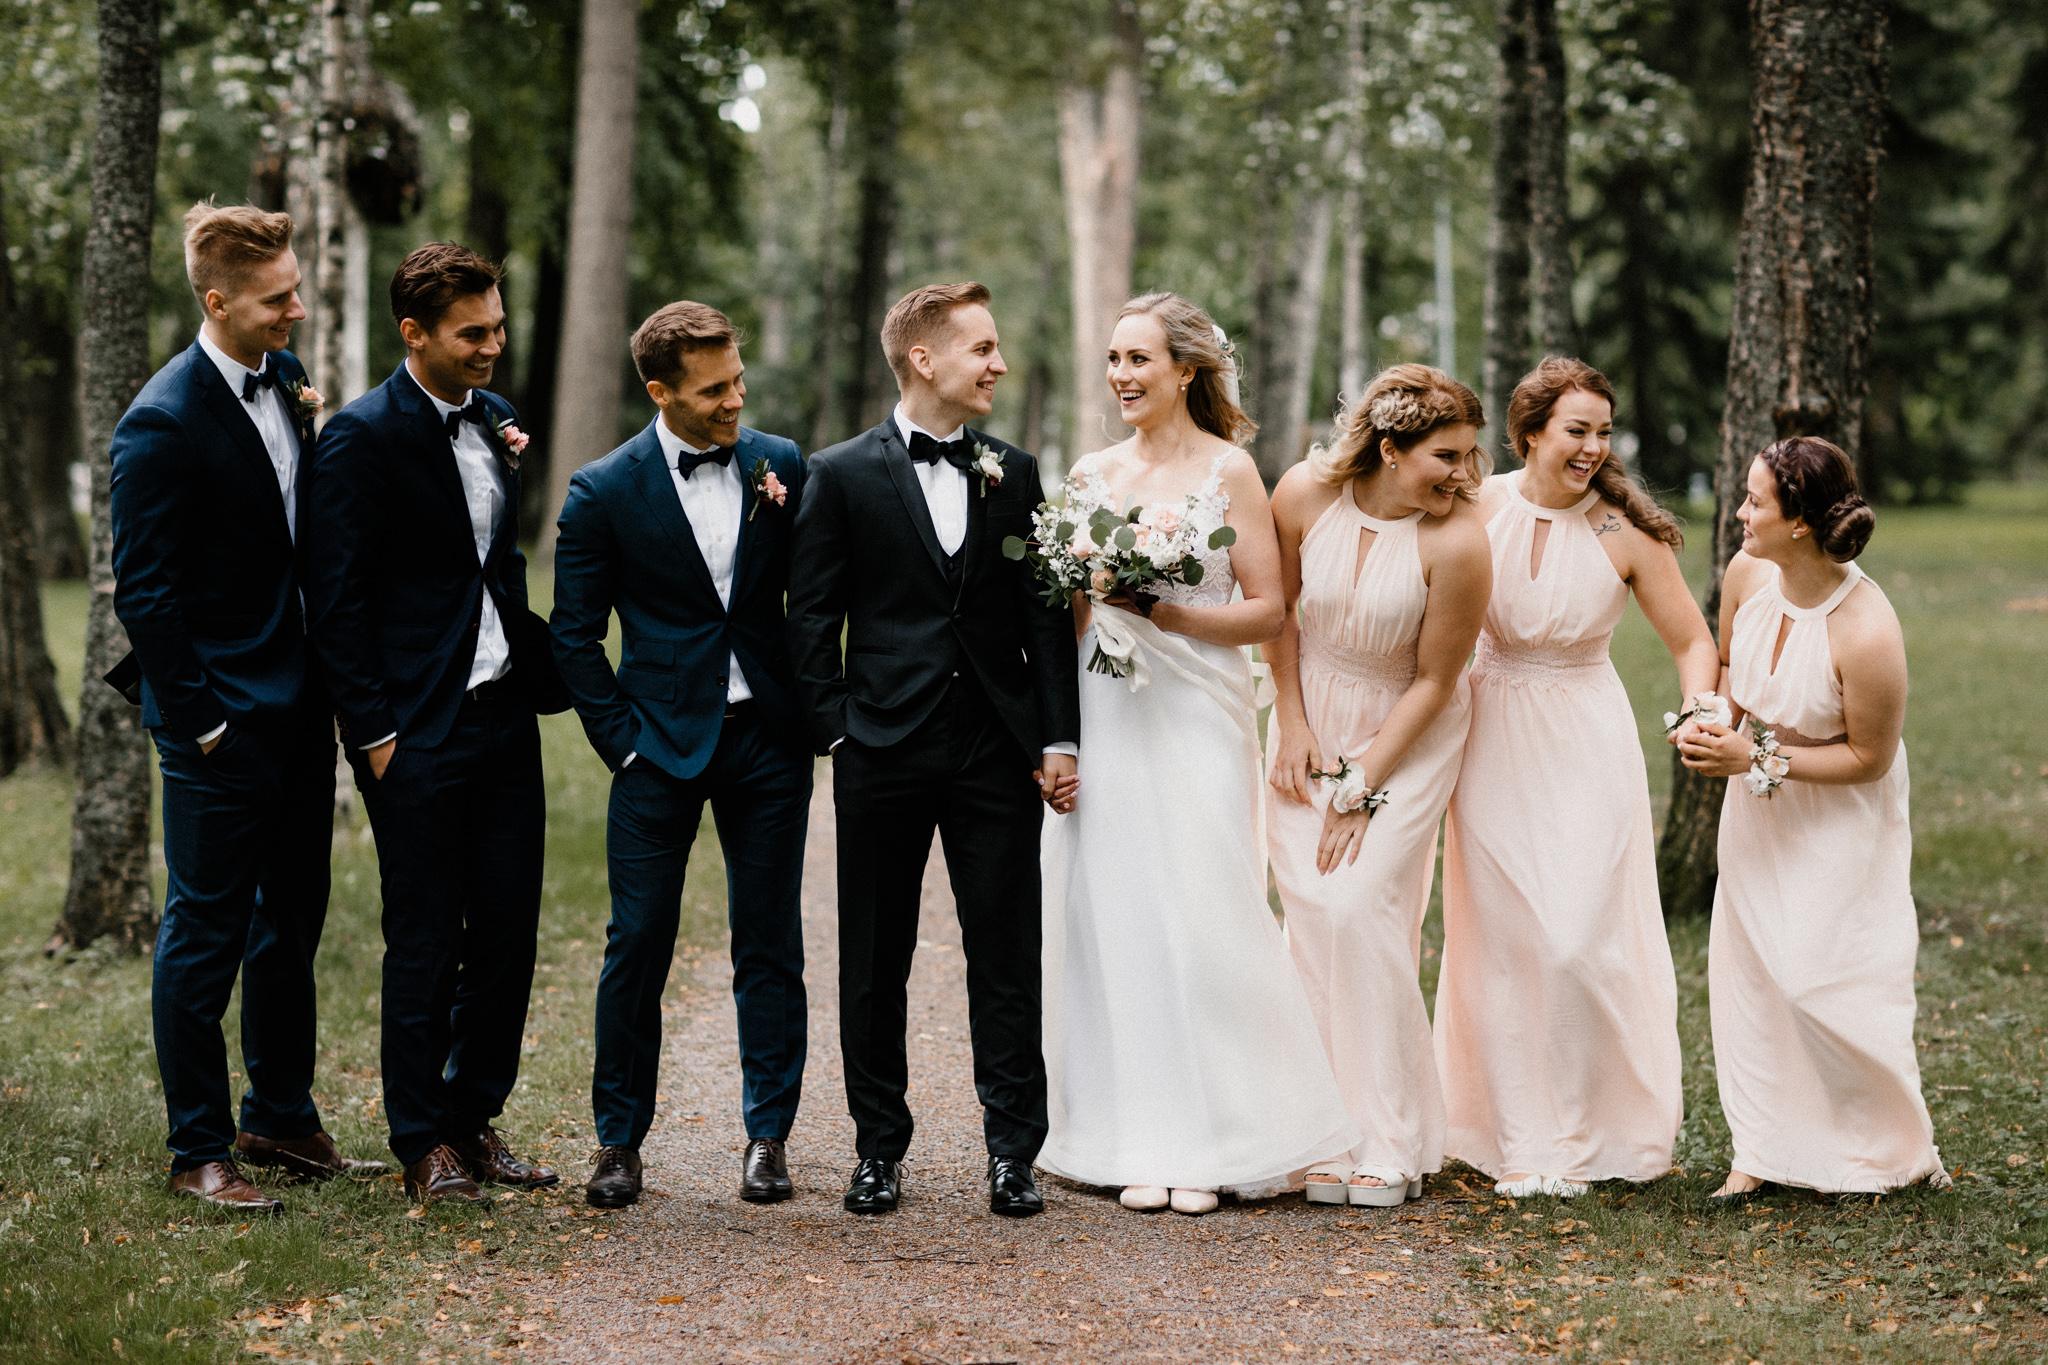 Johanna + Mikko - Tampere - Photo by Patrick Karkkolainen Wedding Photographer-44.jpg